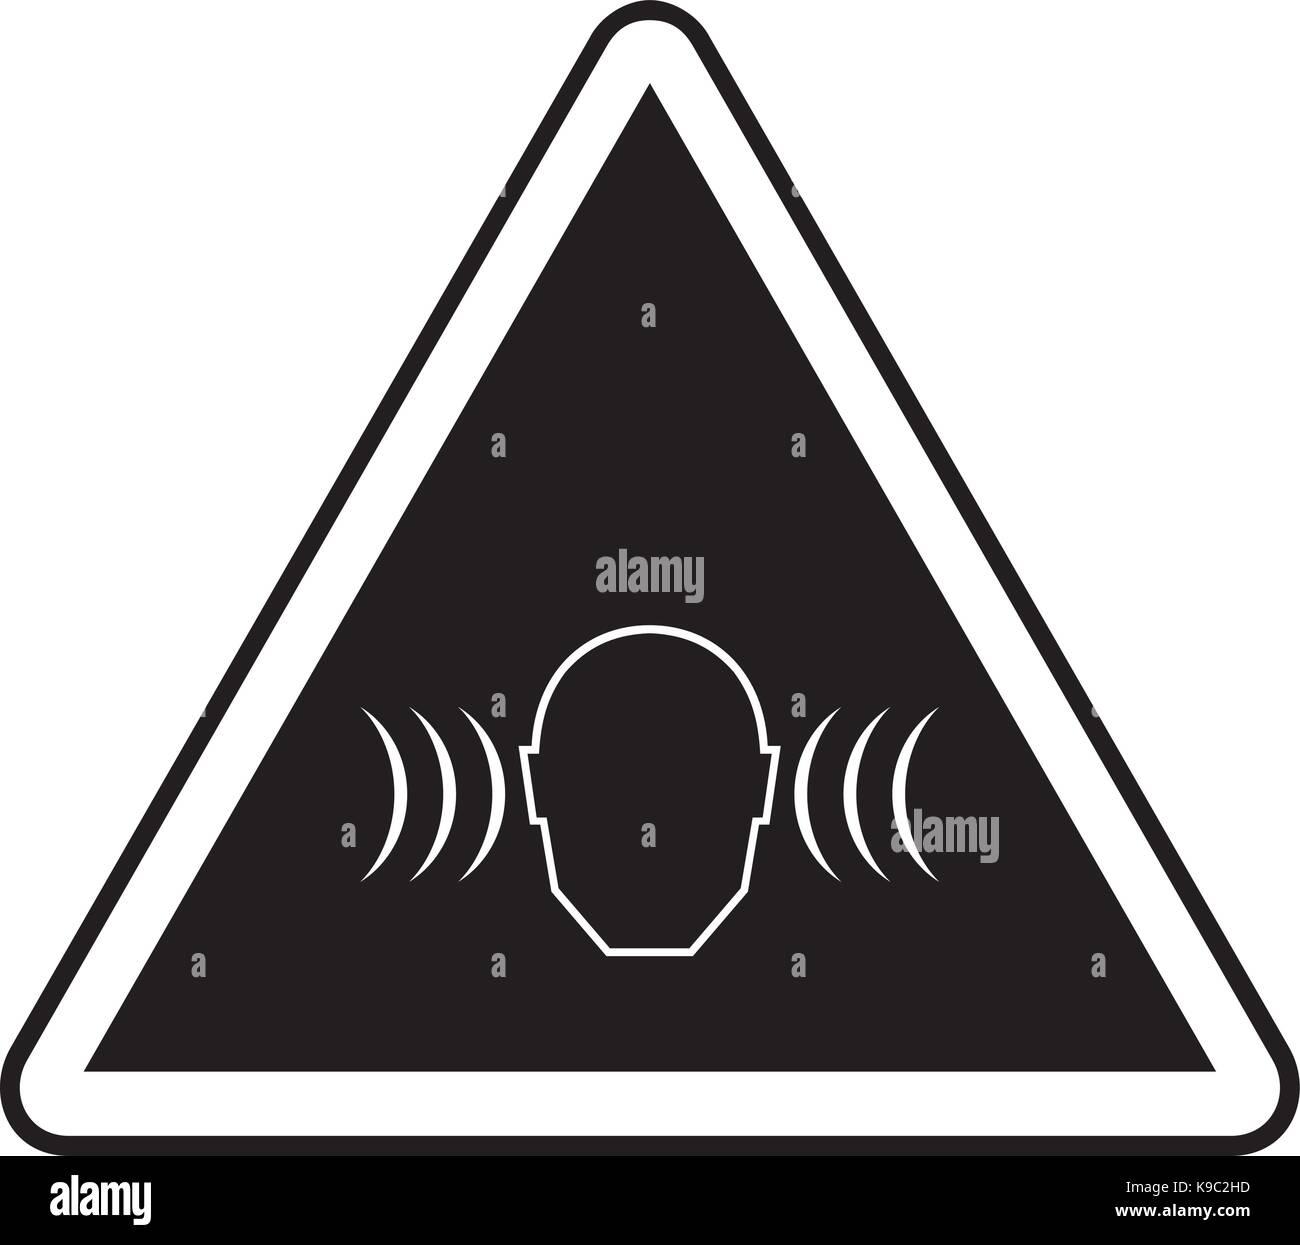 High noise levels warning sign - Stock Image